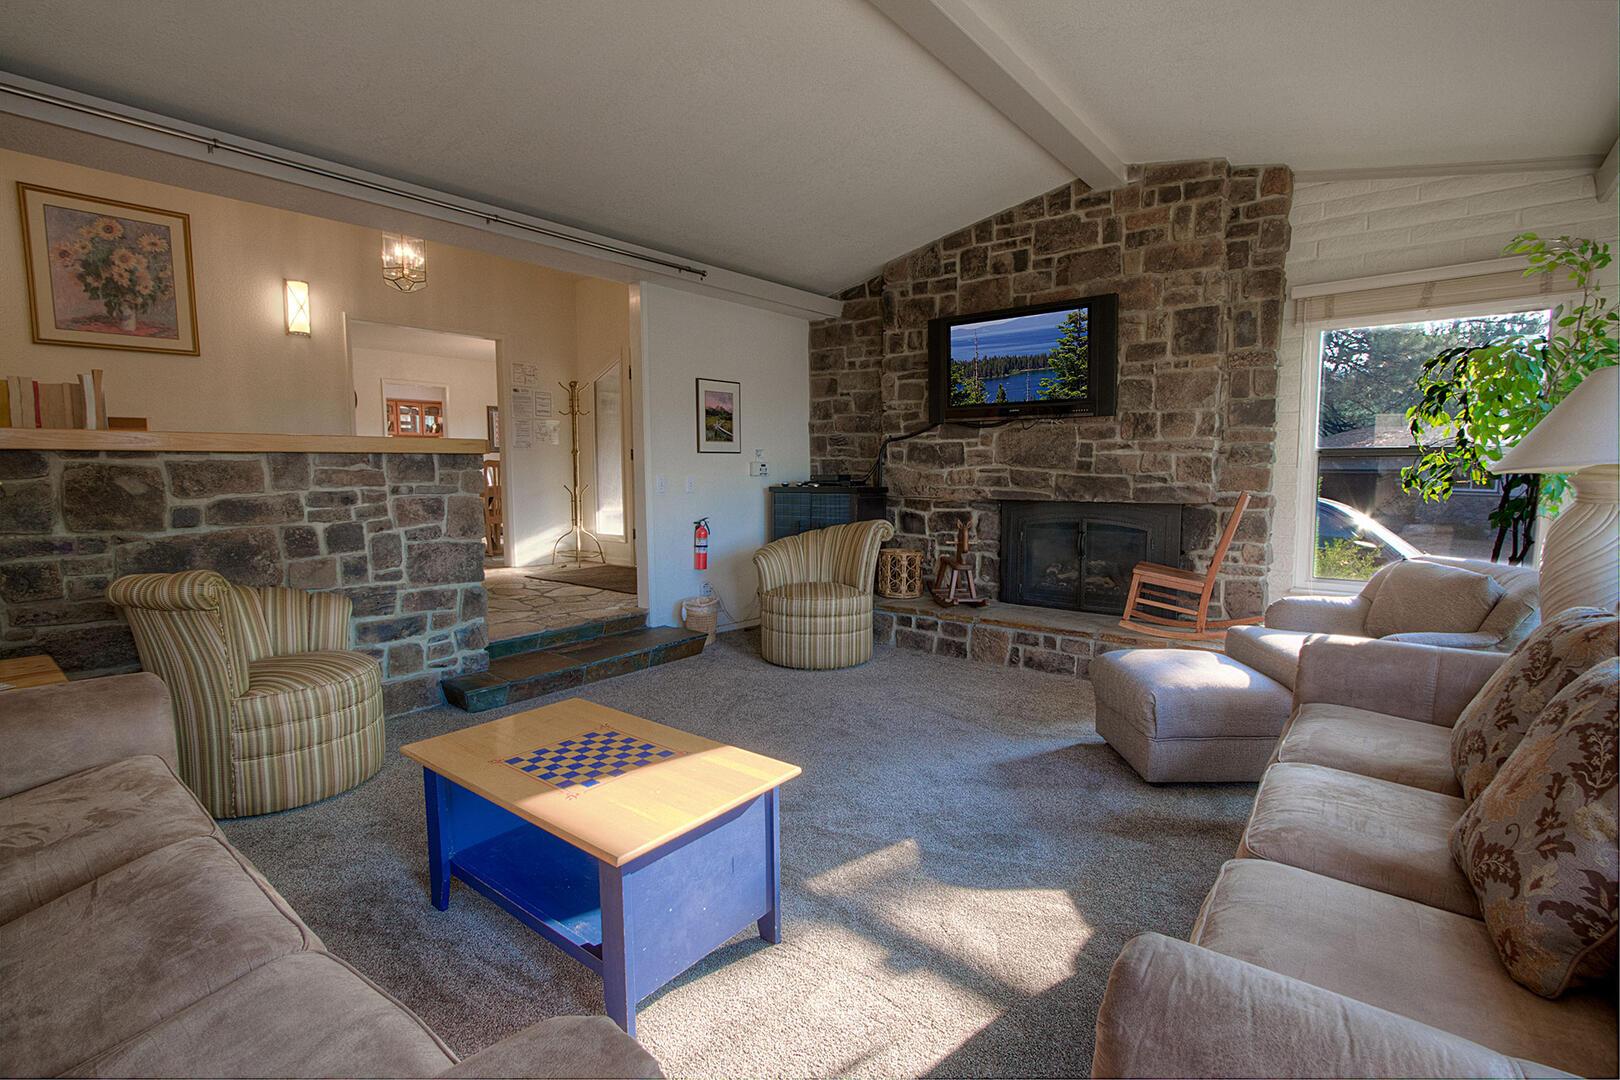 nvh1257 living room